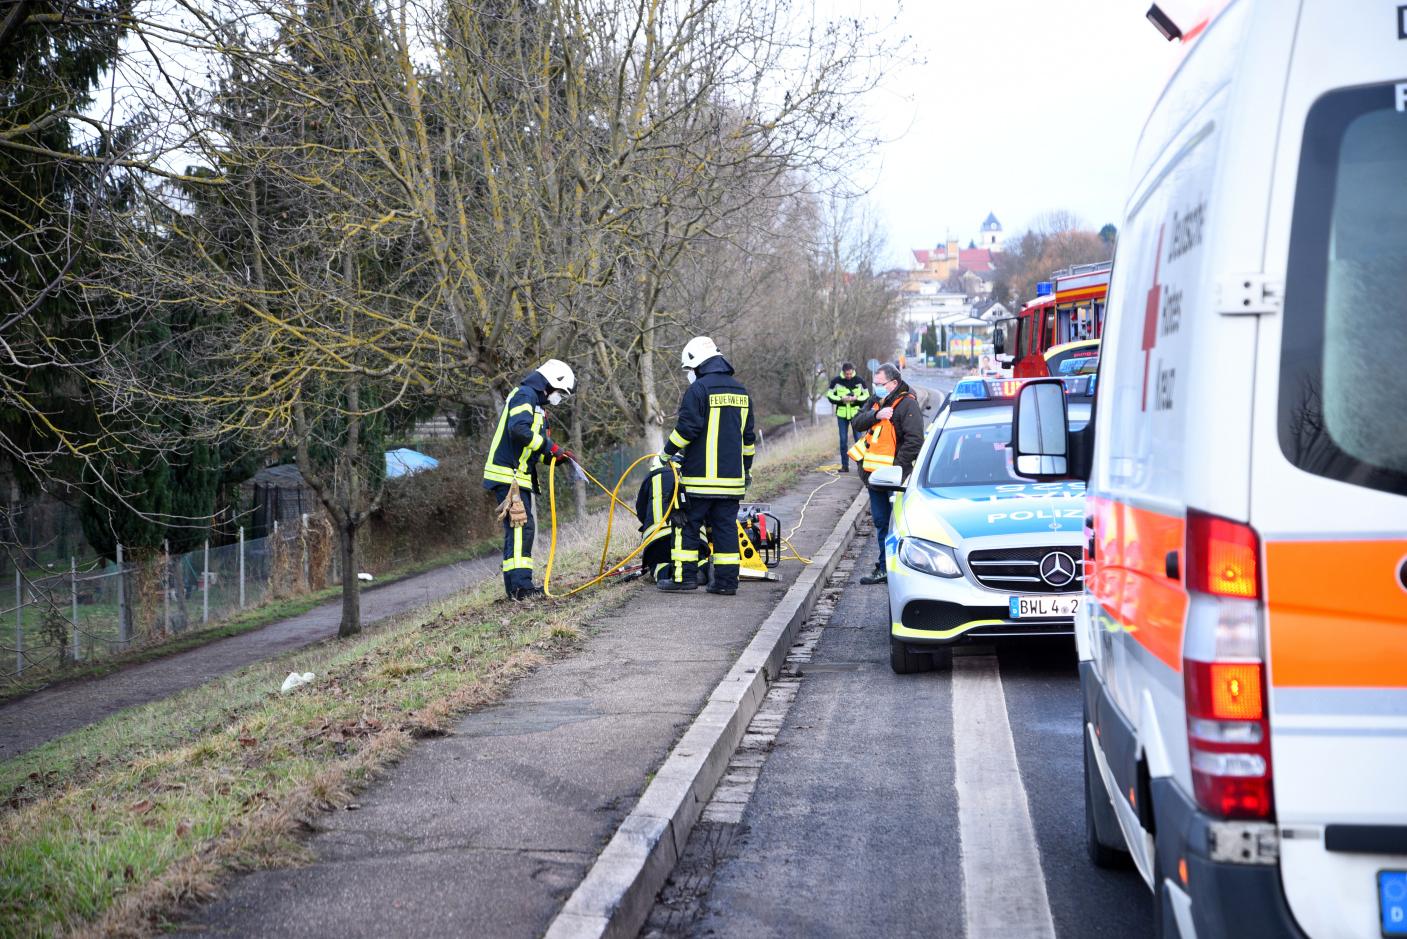 Leimen/Nußloch: Auto prallt gegen Baum - Fahrer verletzt - Zeugen gesucht